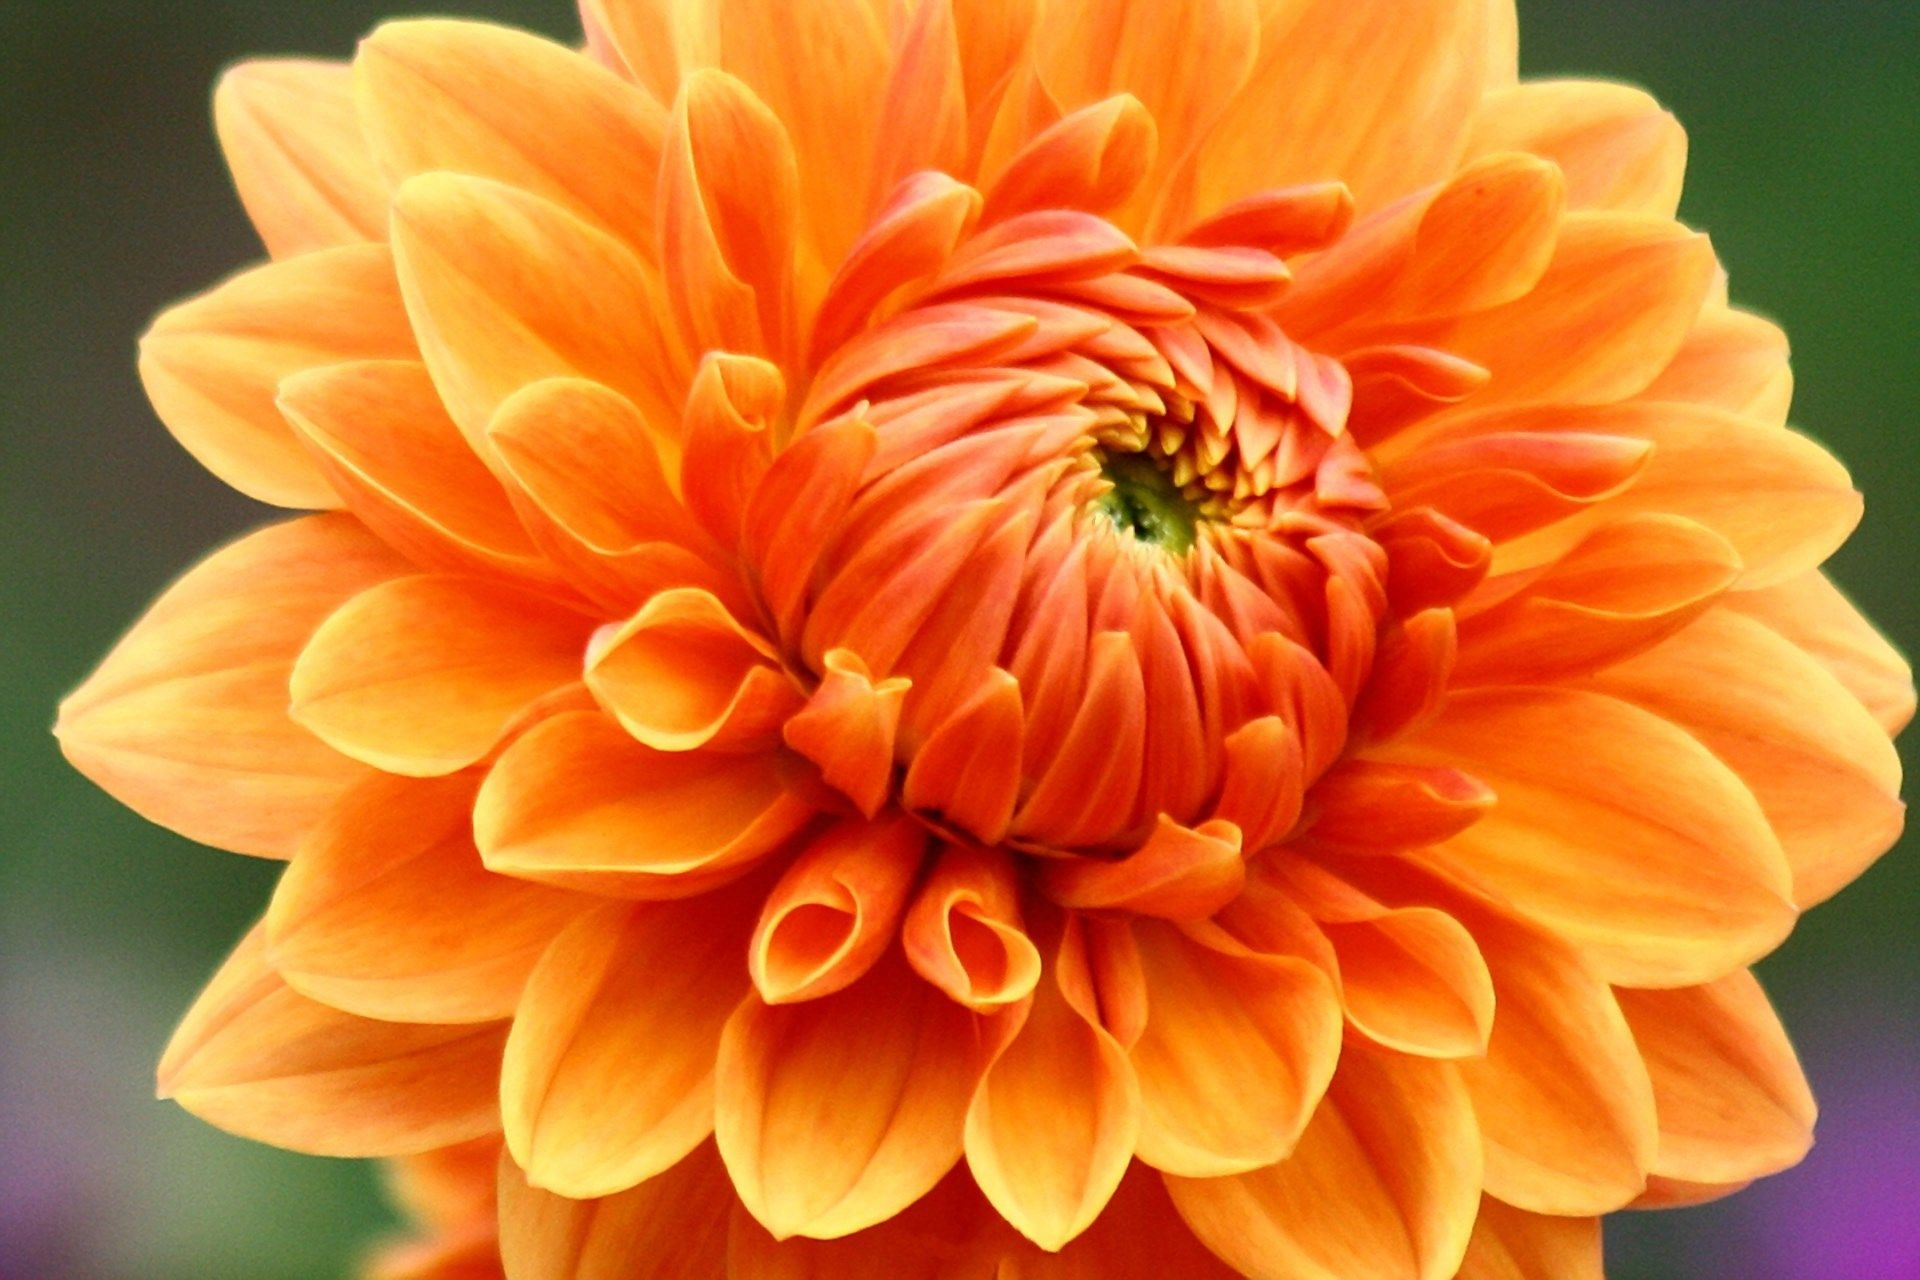 Free Desktop Wallpaper Downloads Dahlia Dahlia Flower Flowers November Flower